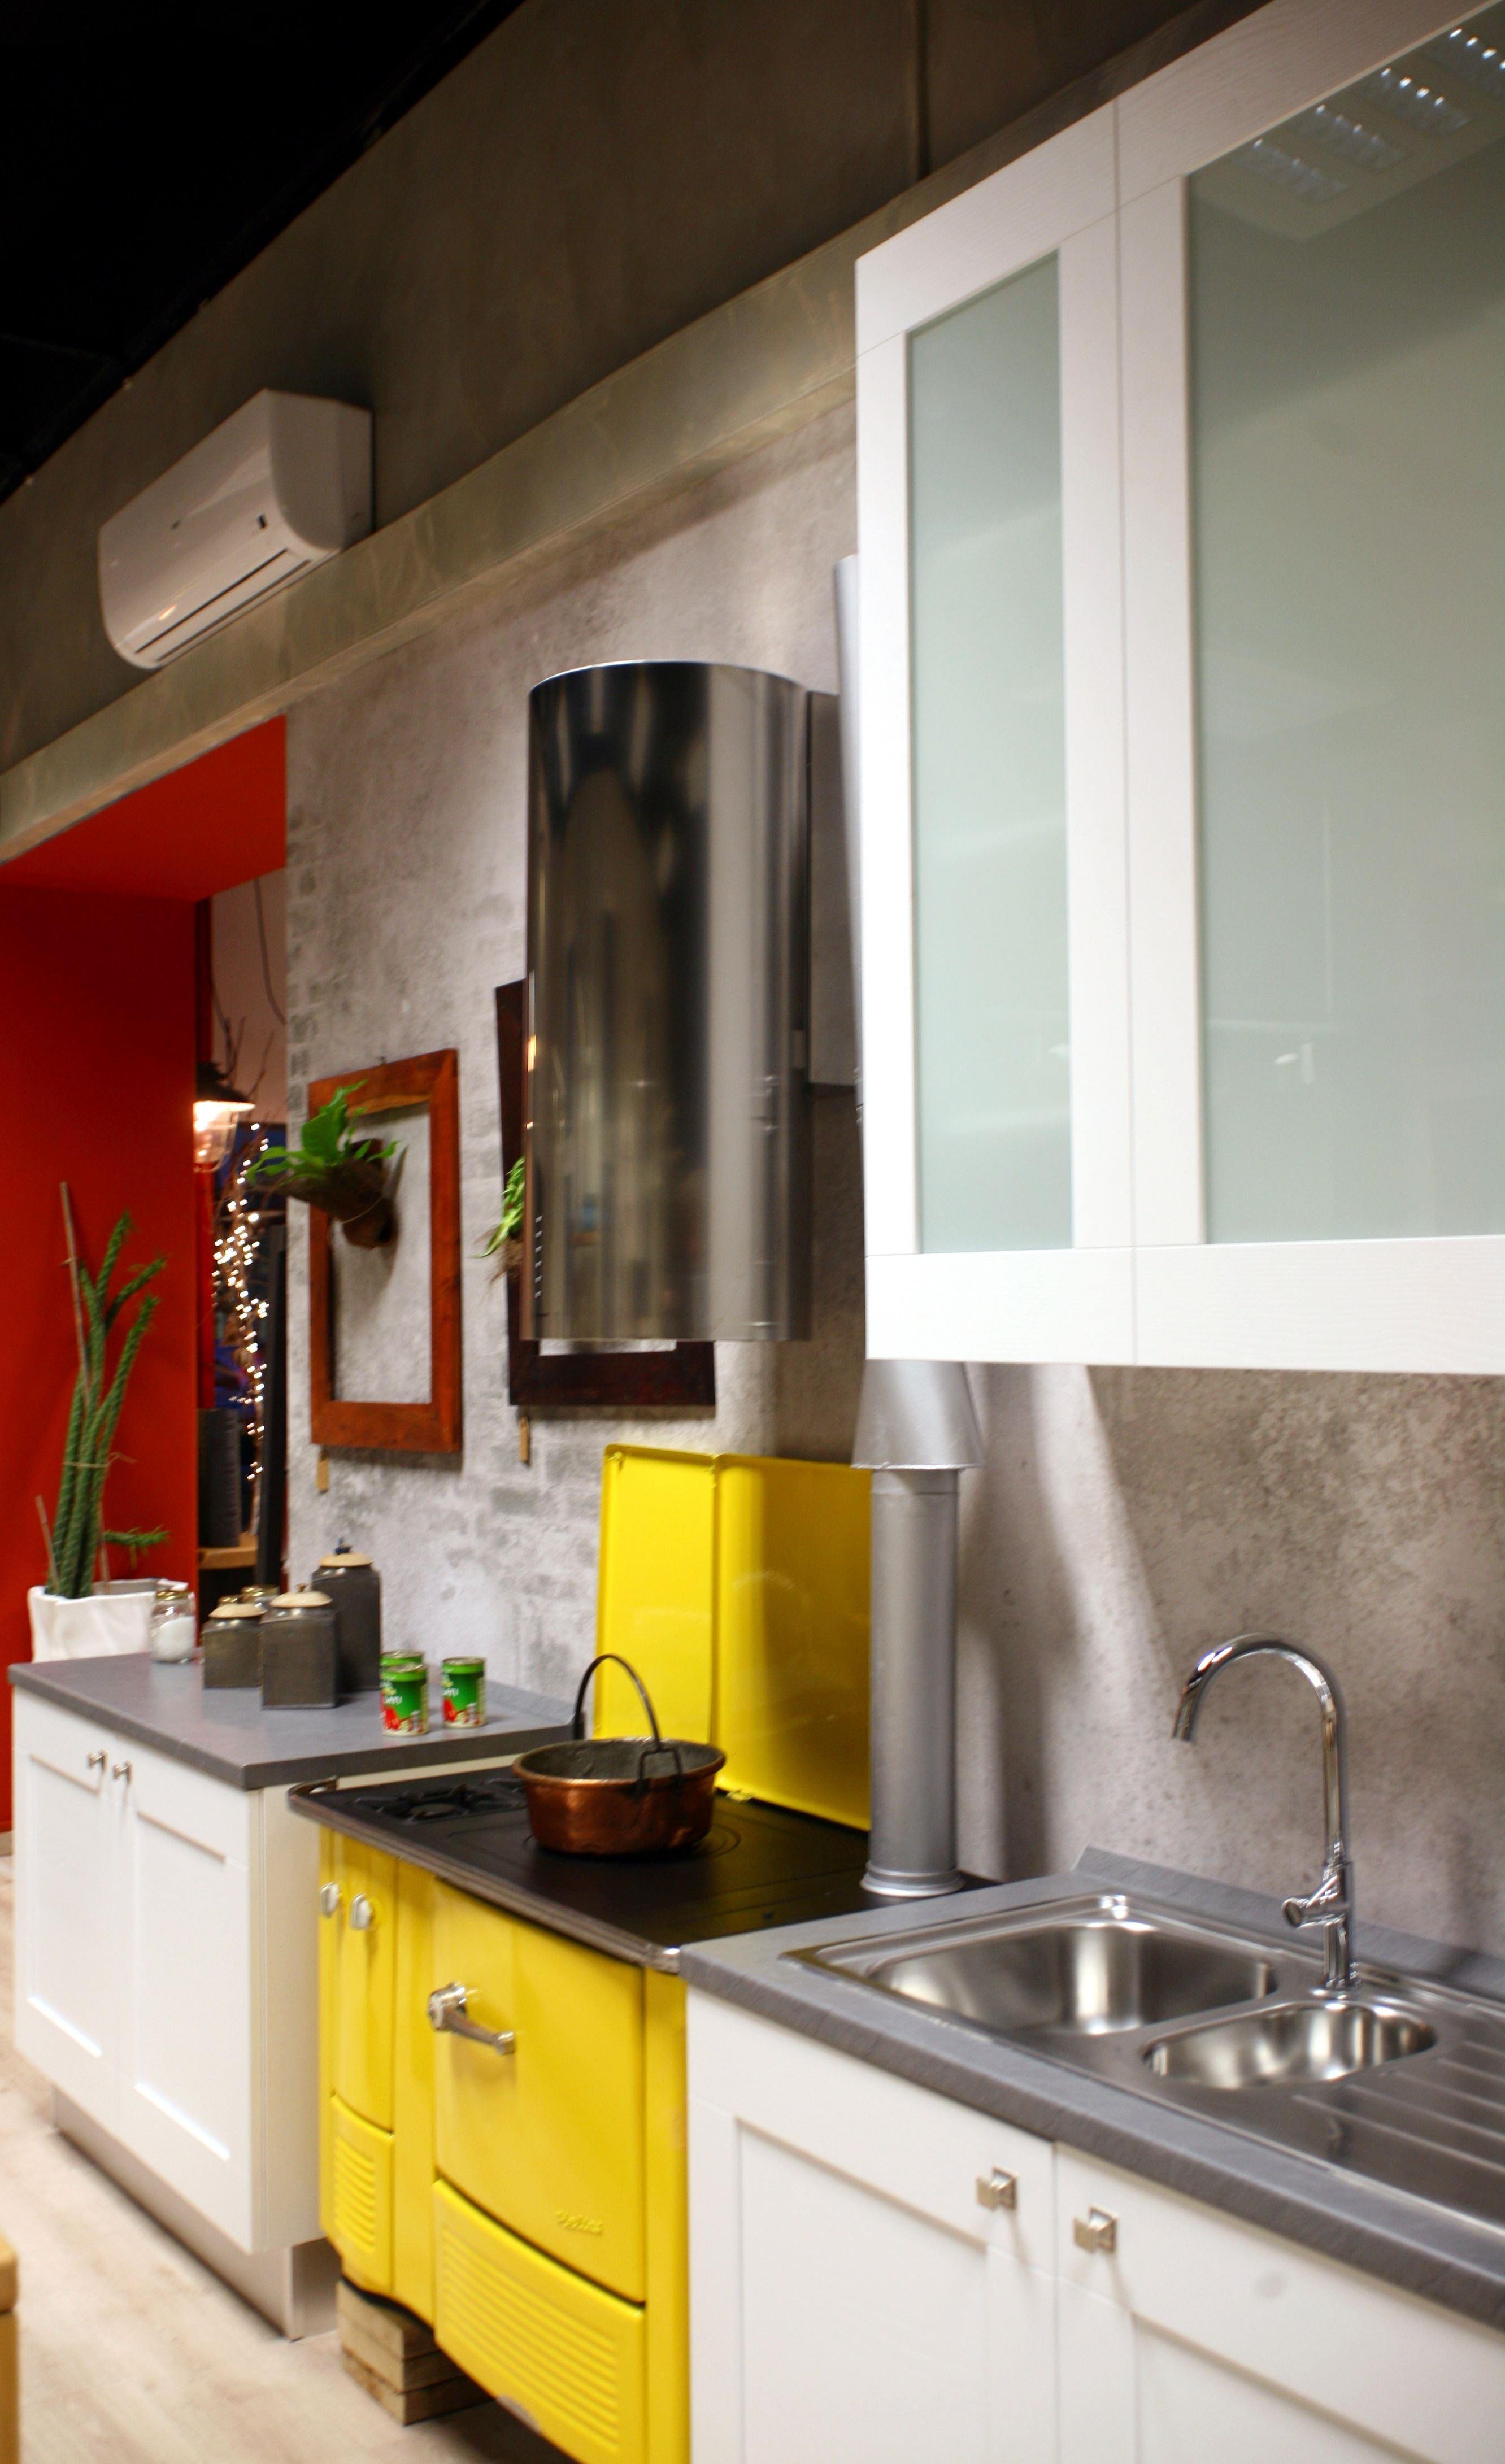 Stunning cucine stile provenzale offerte ideas ideas for Cucine design offerte